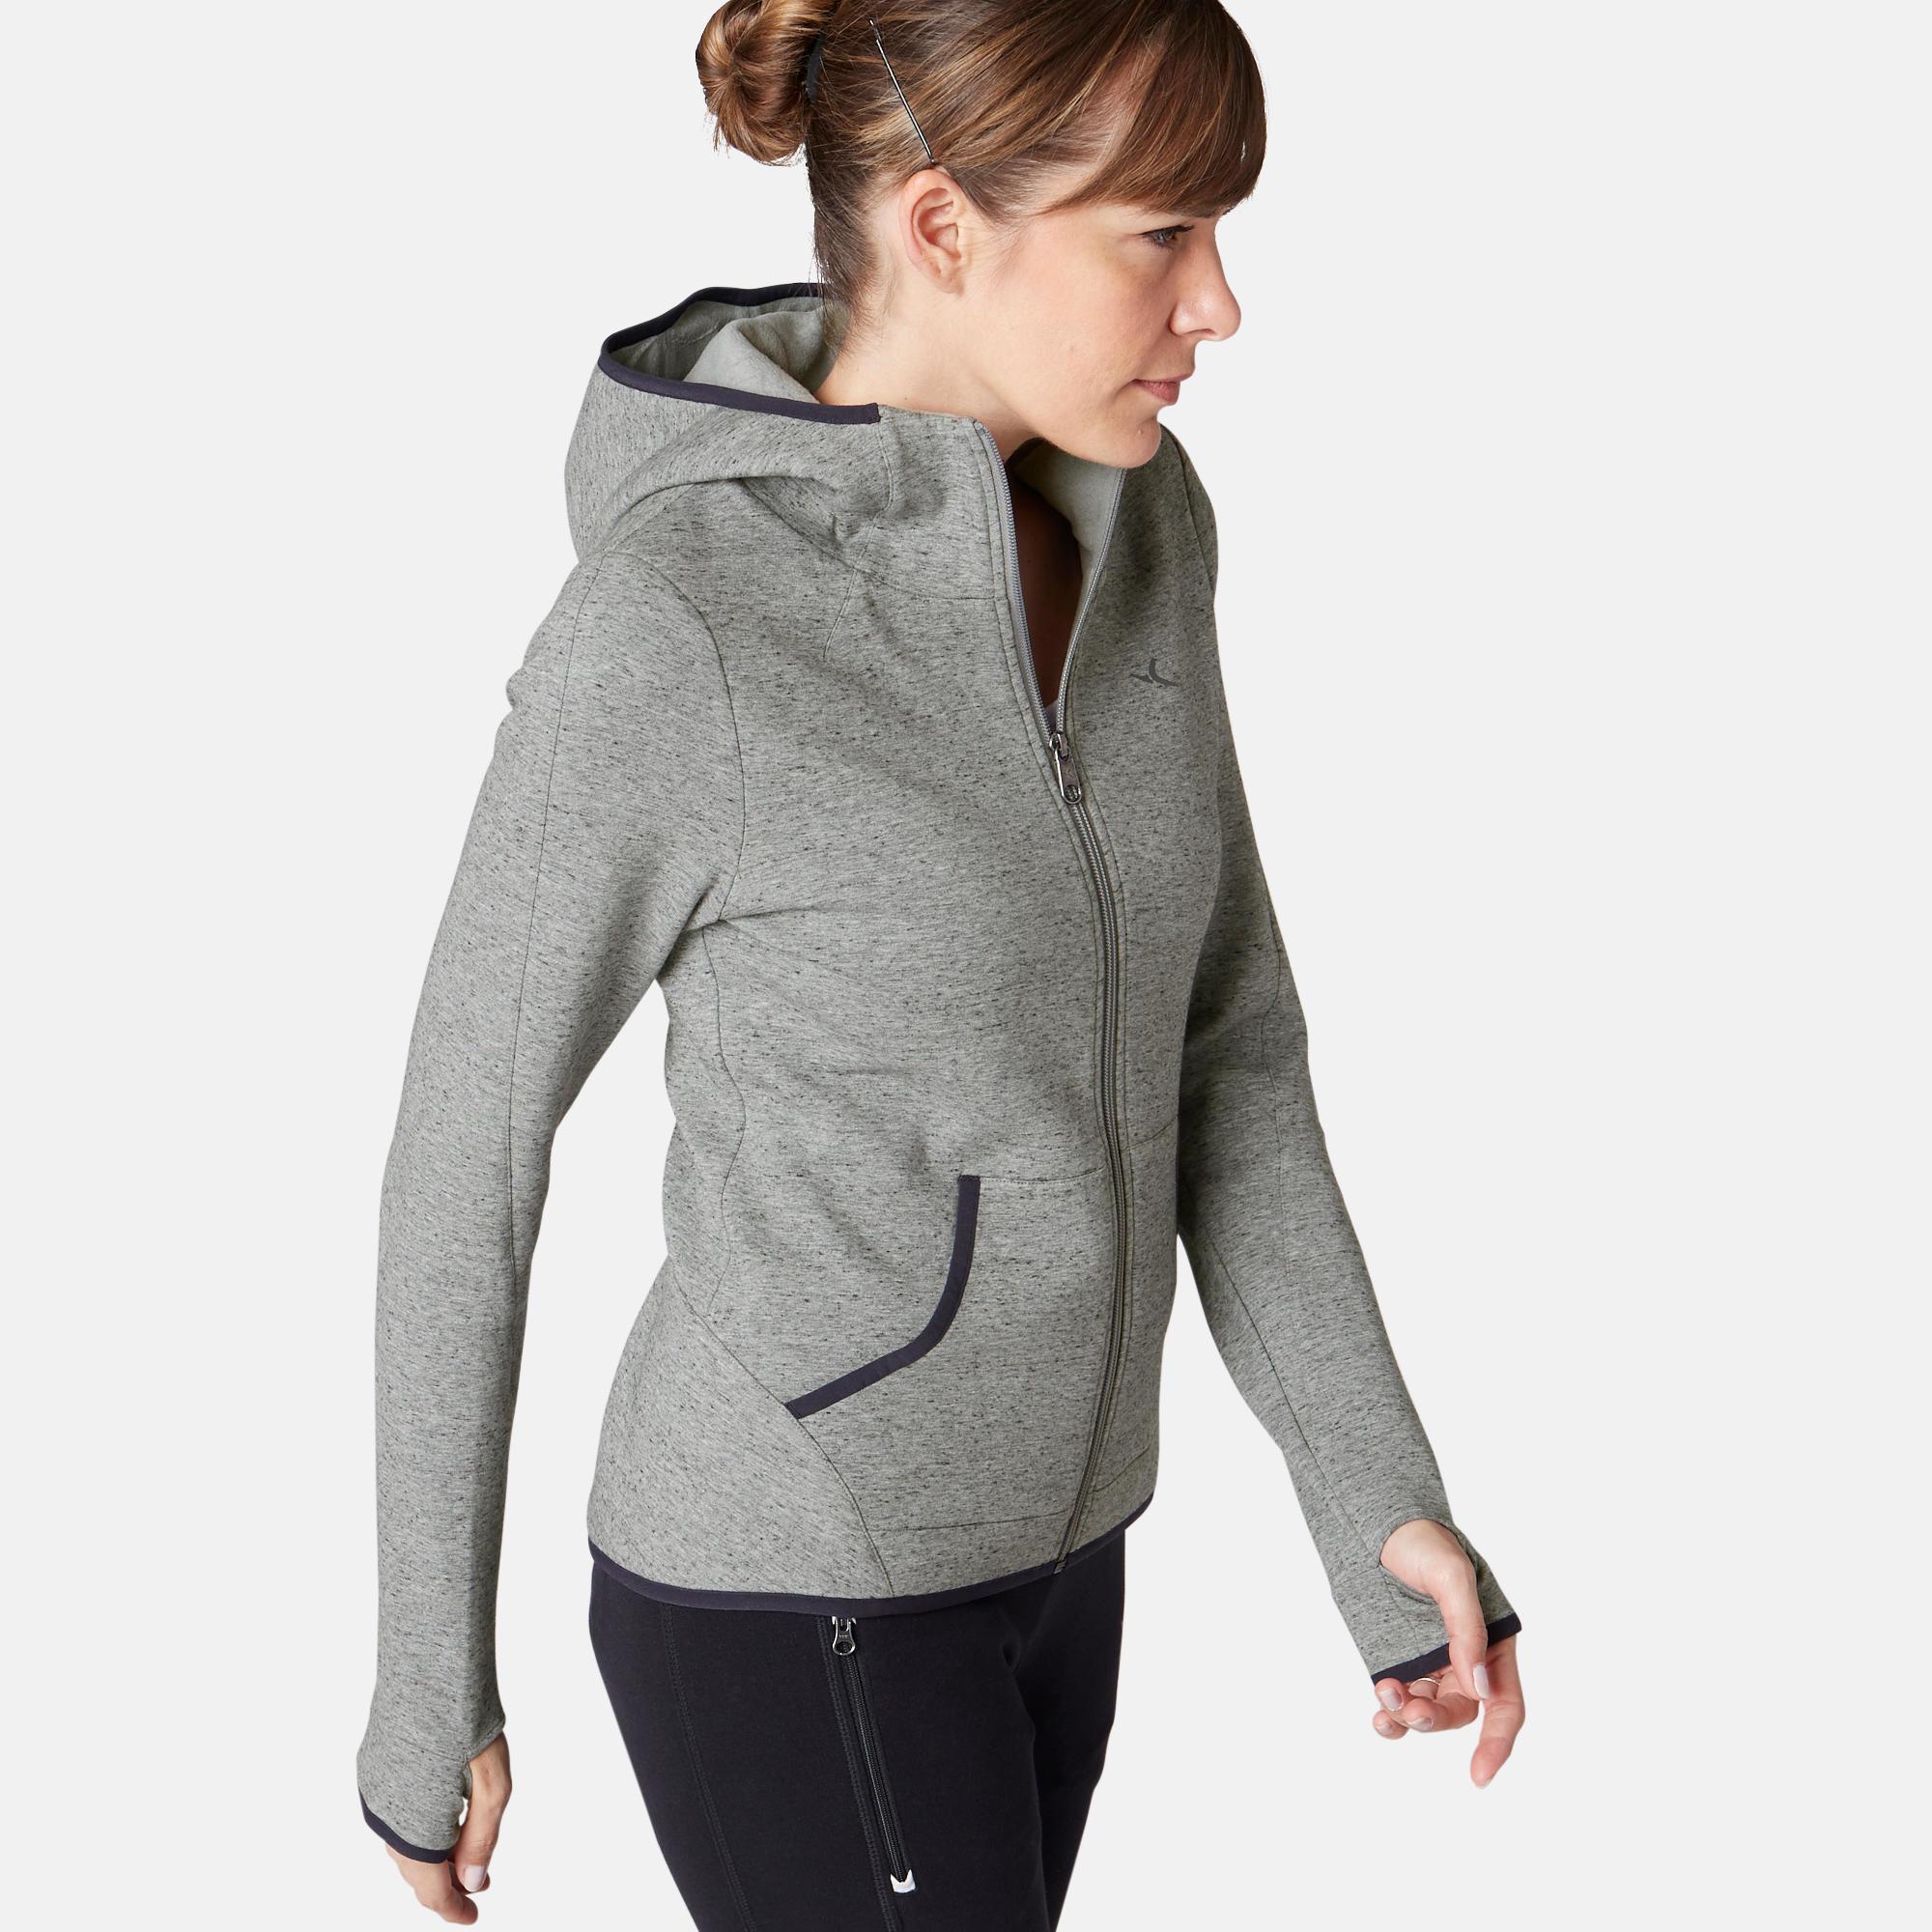 Domyos Veste 900 spacer capuche Pilates Gym douce femme gris - Domyos